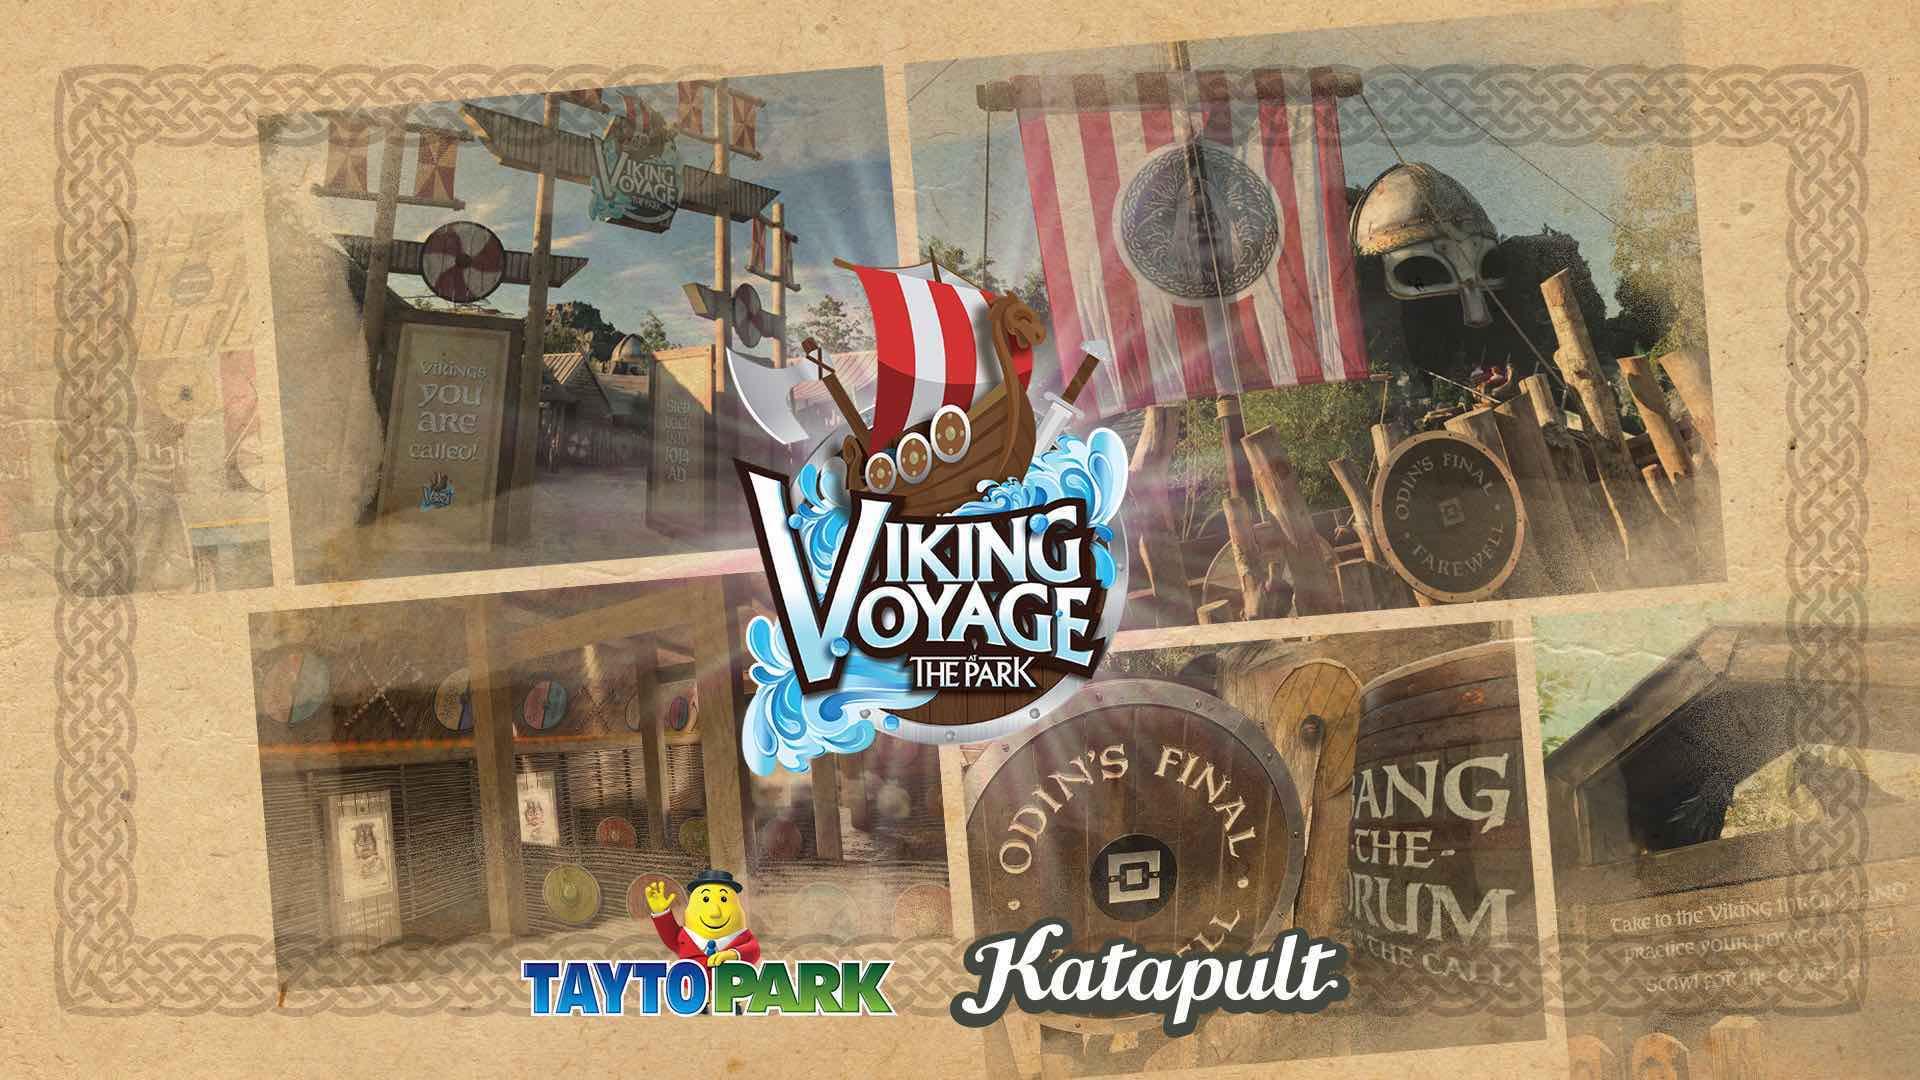 Viking Voyage at the Park Tayto Park and Katapult queue line